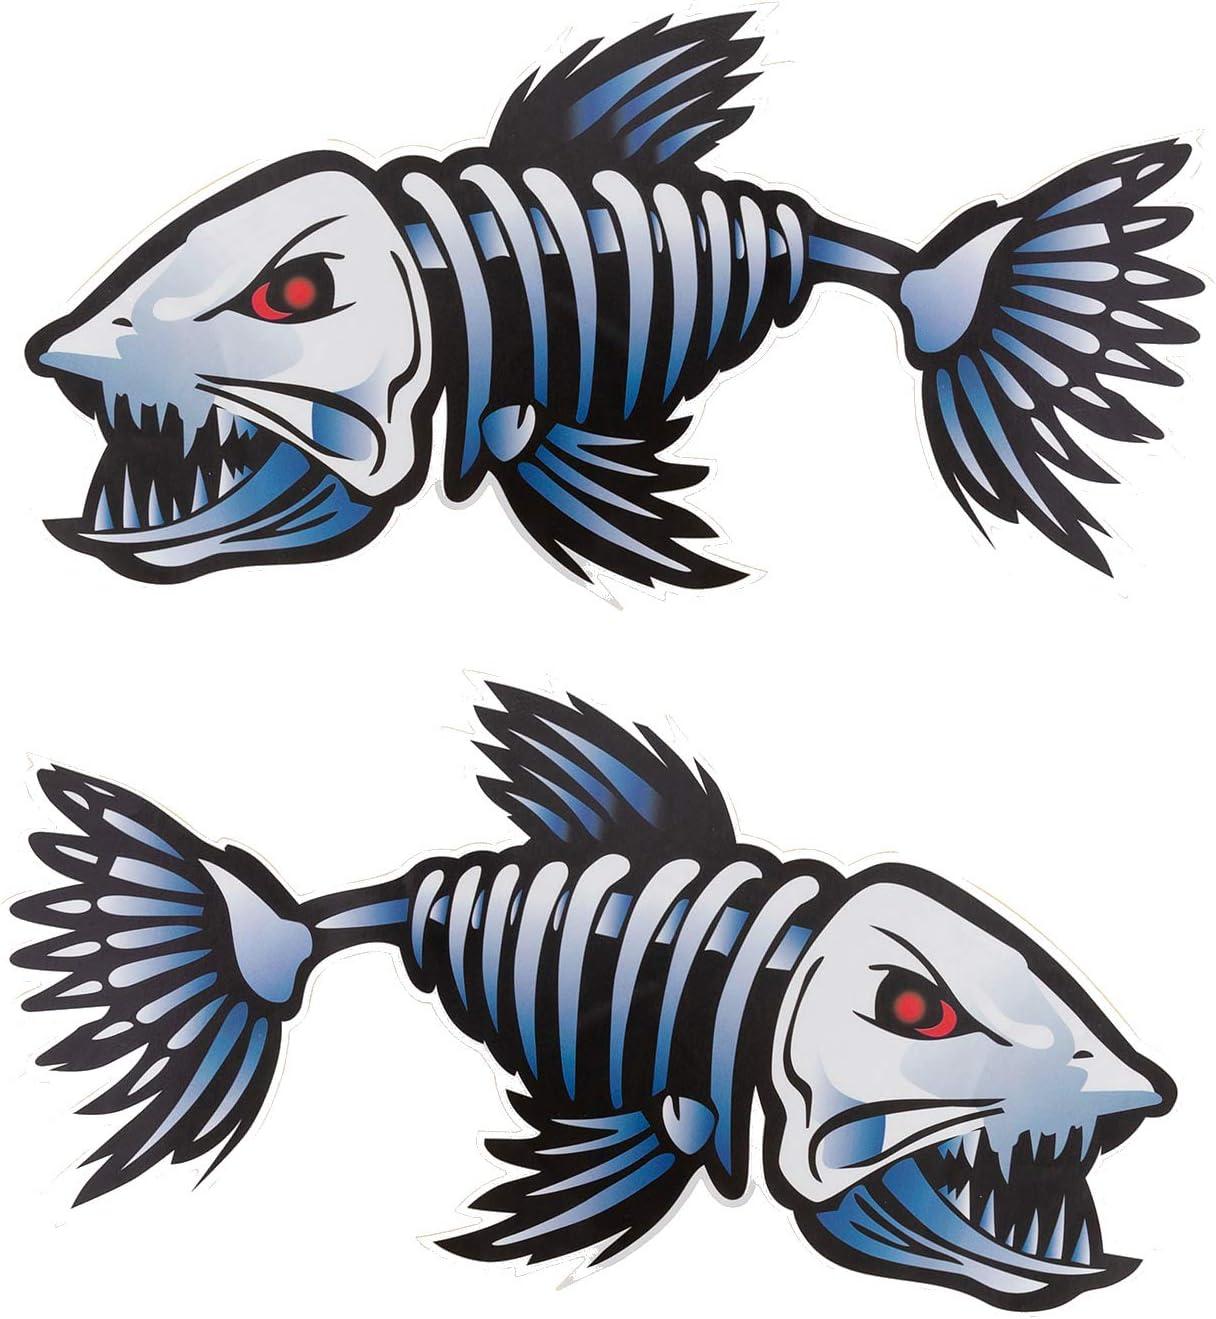 Ikerall Fish Bones Skeleton Stickers Reflective Decals Graphics Suitable for Fishing Boat Canoe Car Truck Kayak Windows etc